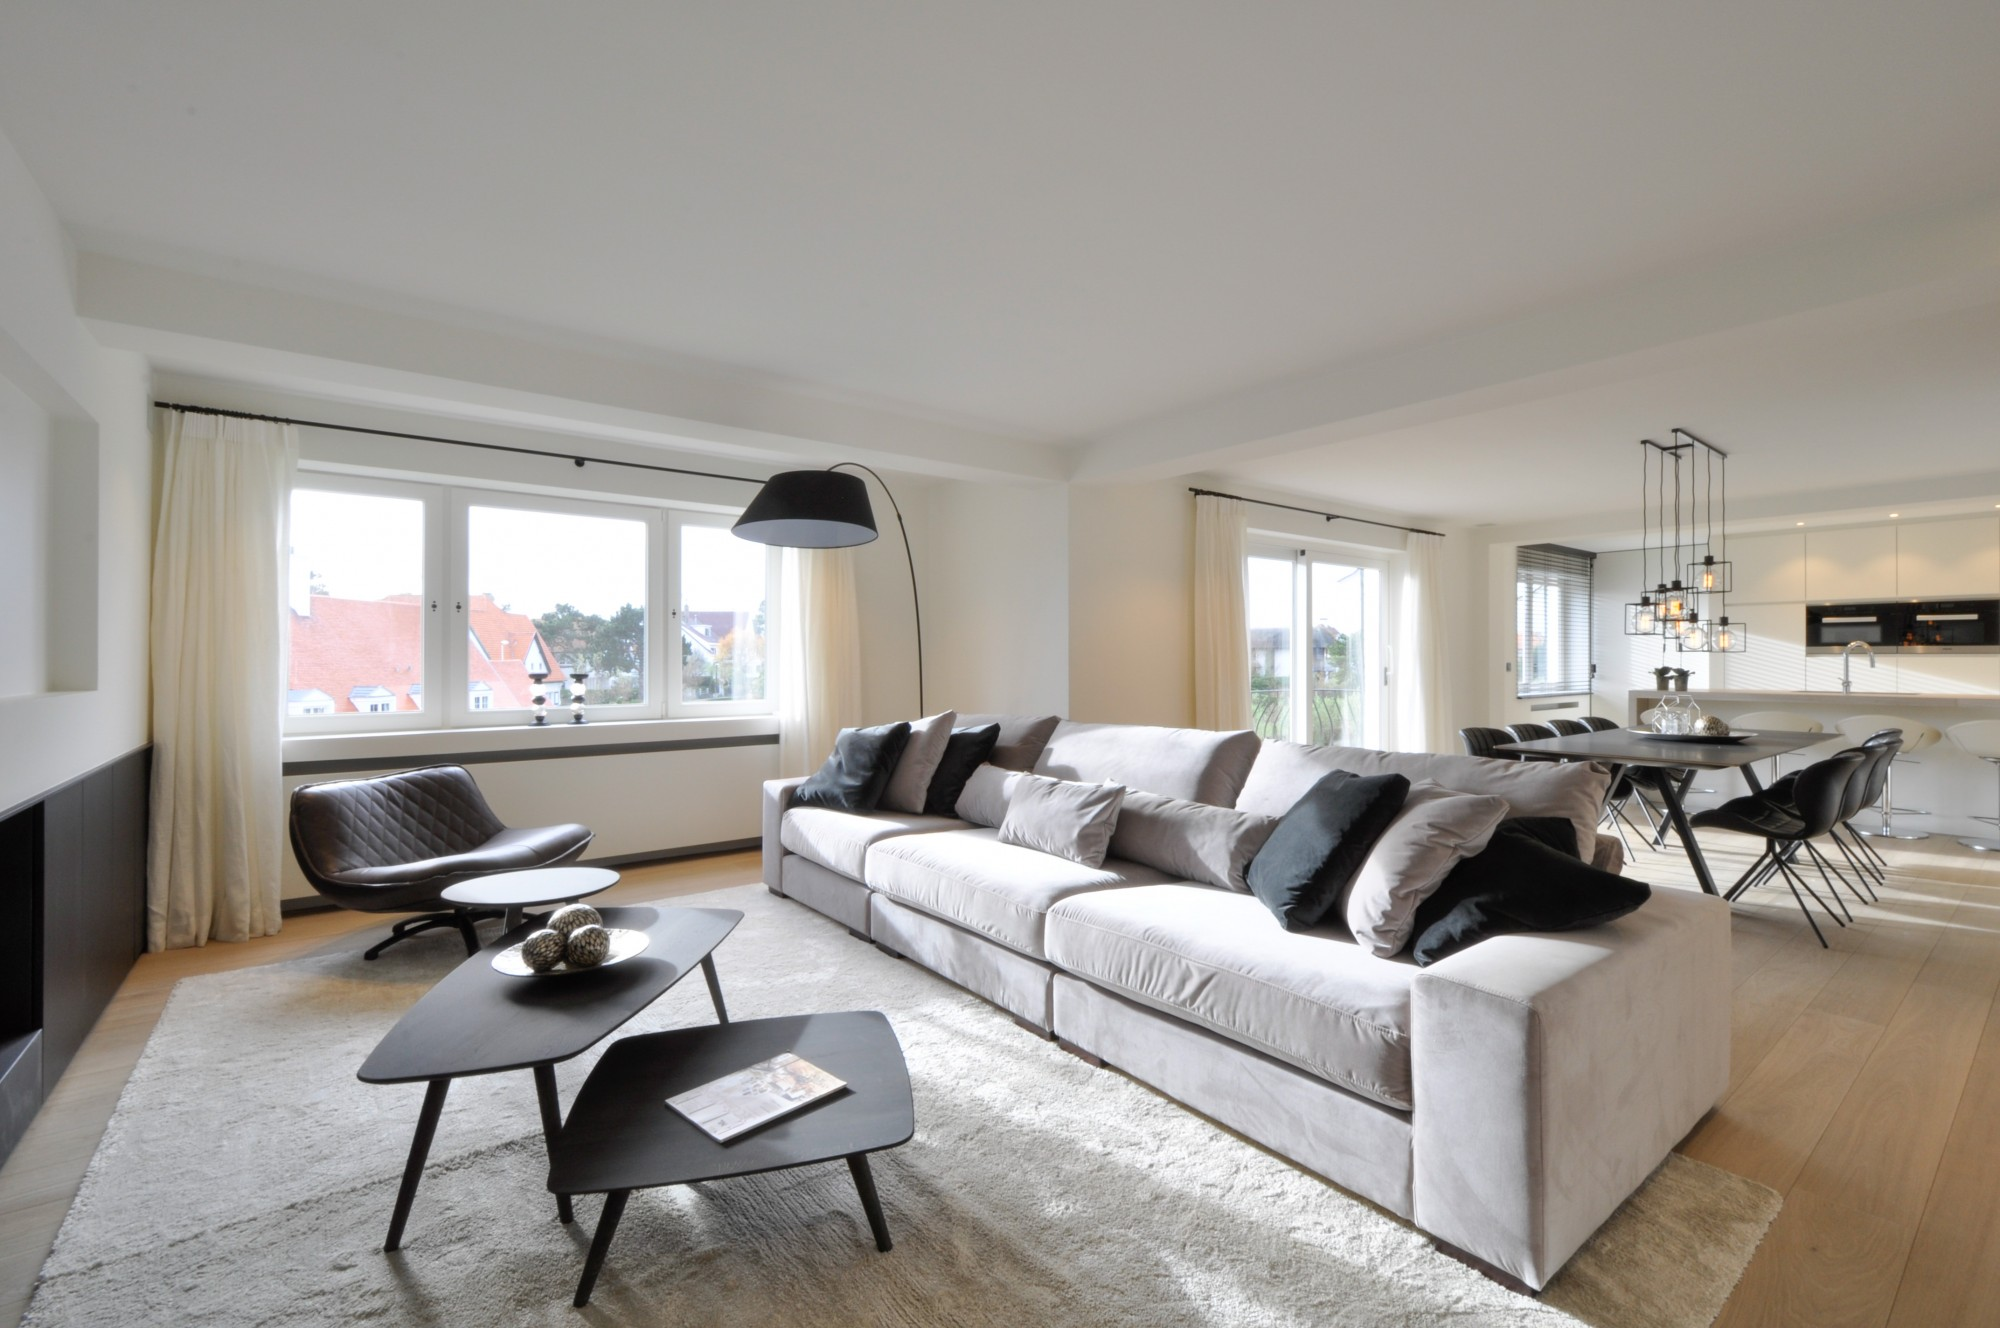 Renovatie Badkamer Knokke : Verkoop appartement t f knokke zoute hedendaagse renovatie